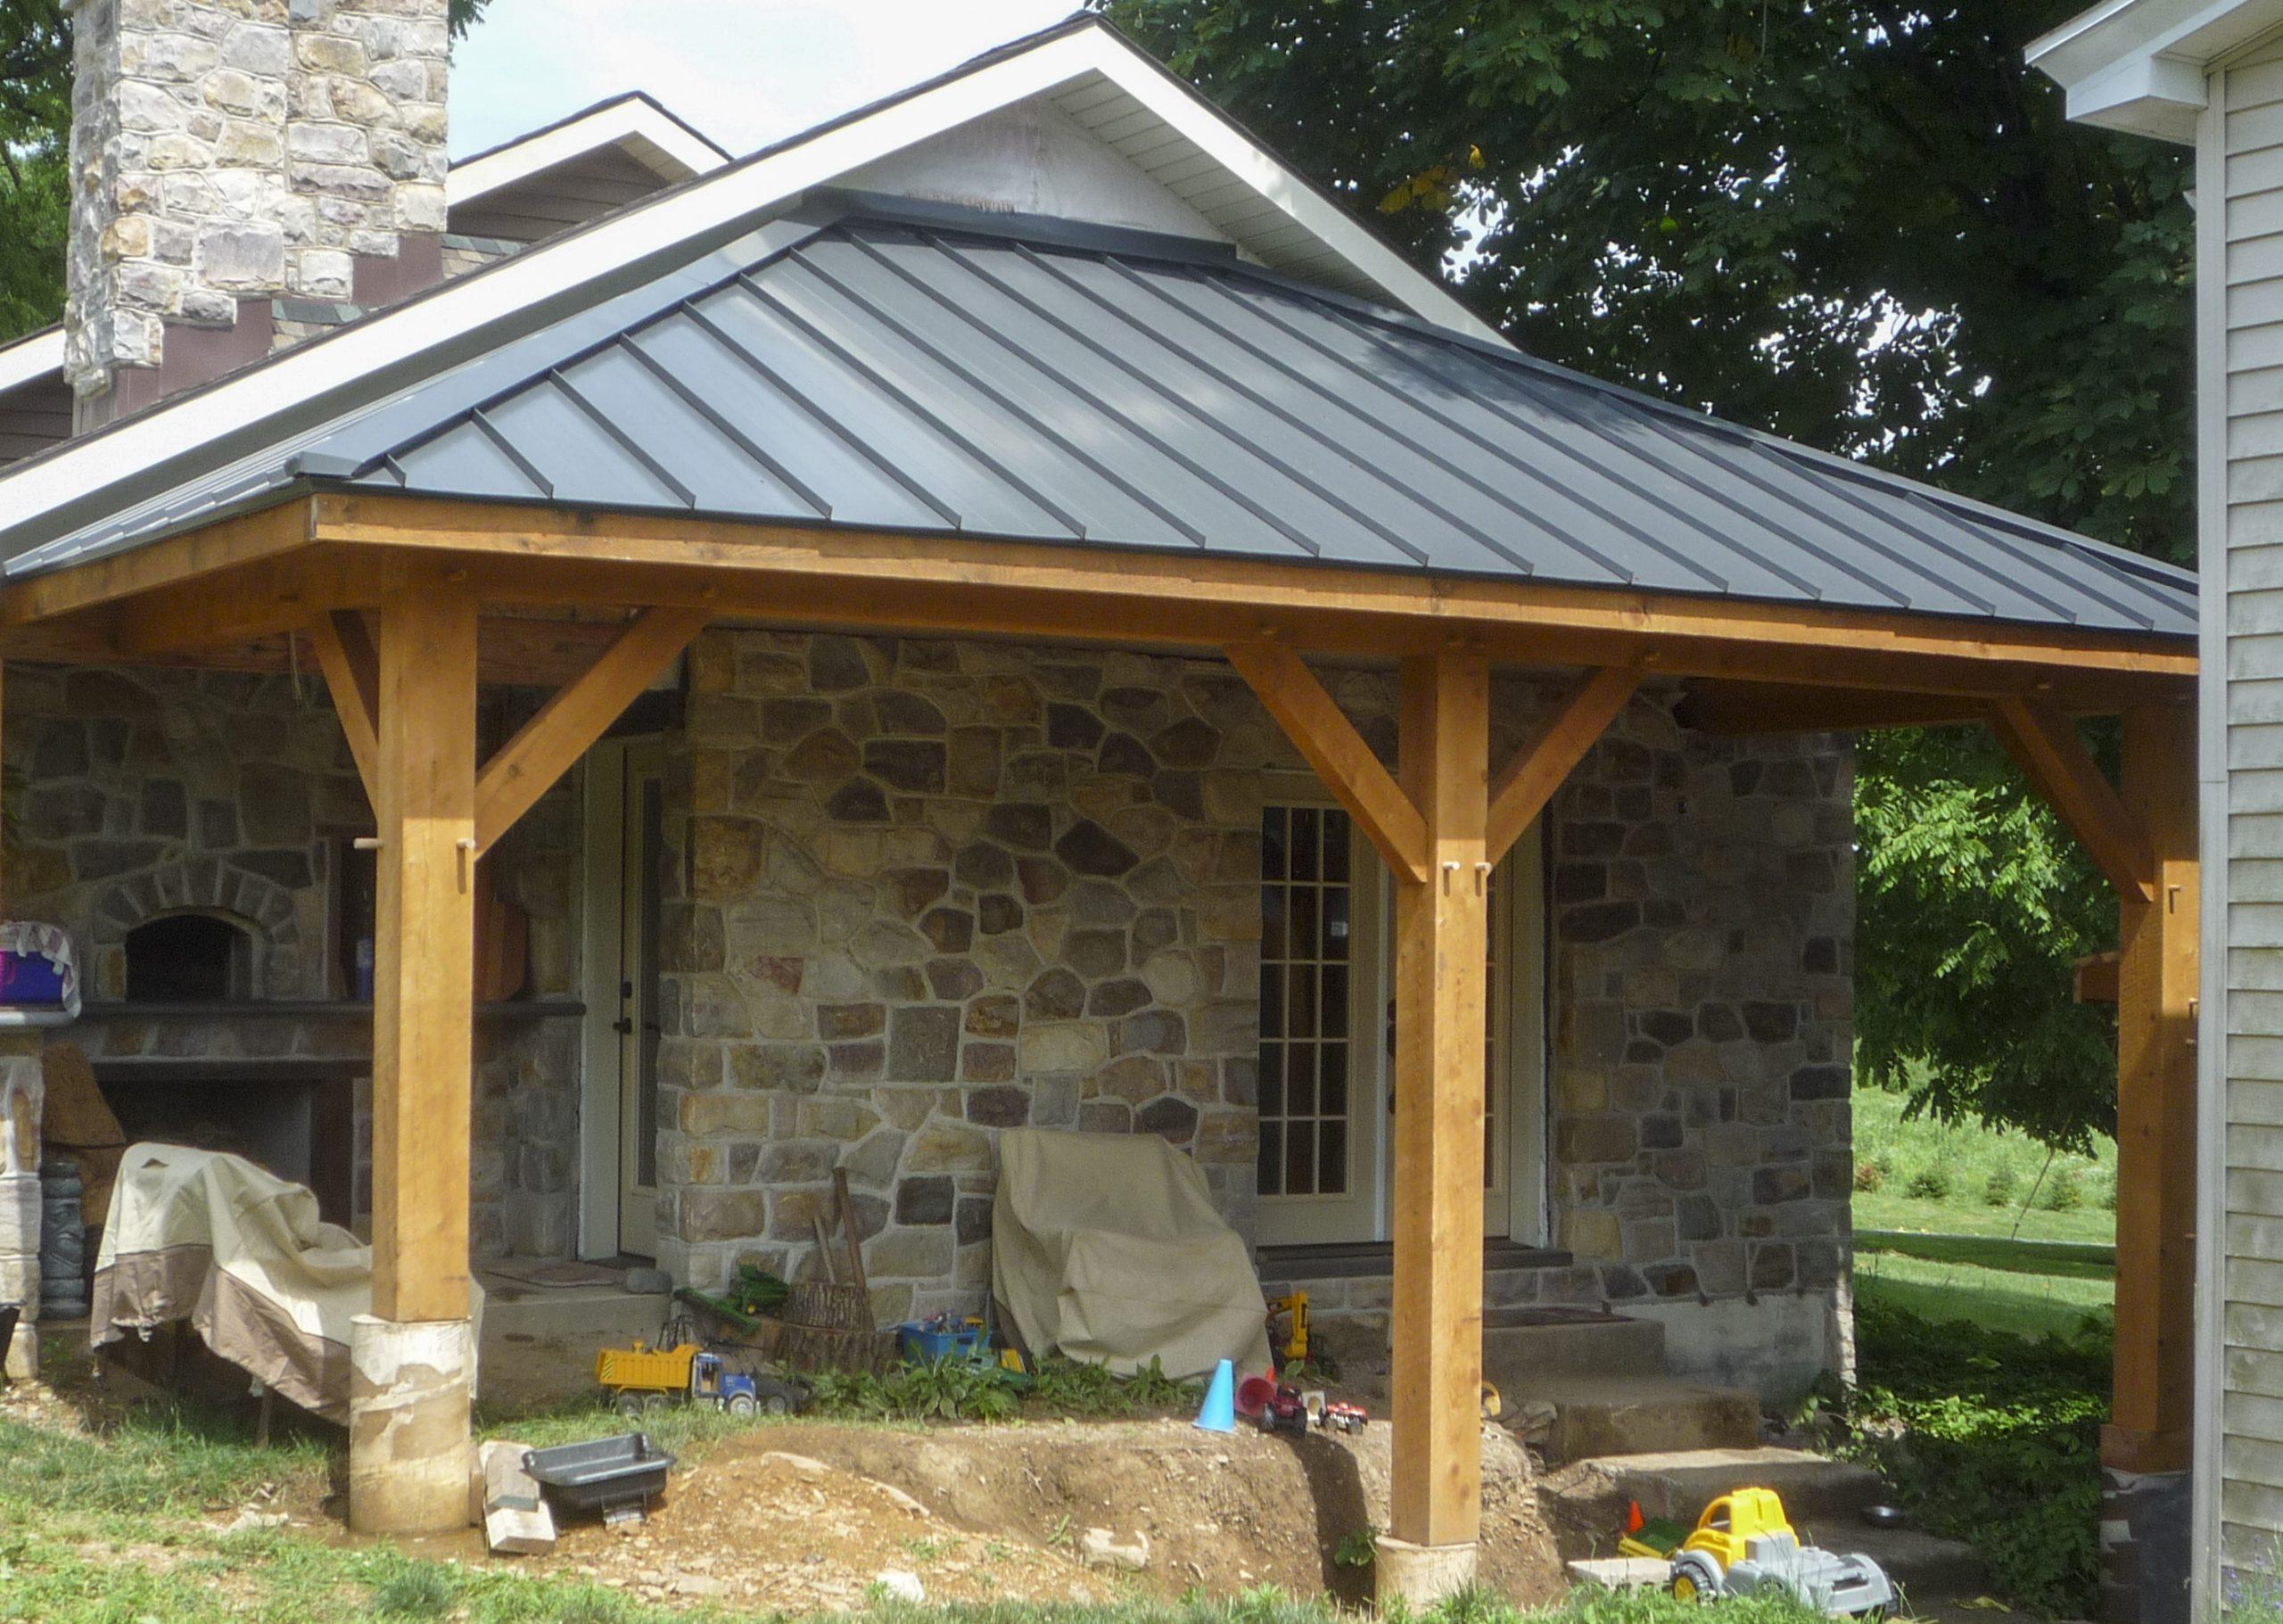 Timber Frame Renovations Aaron King Llc Lasting Additions